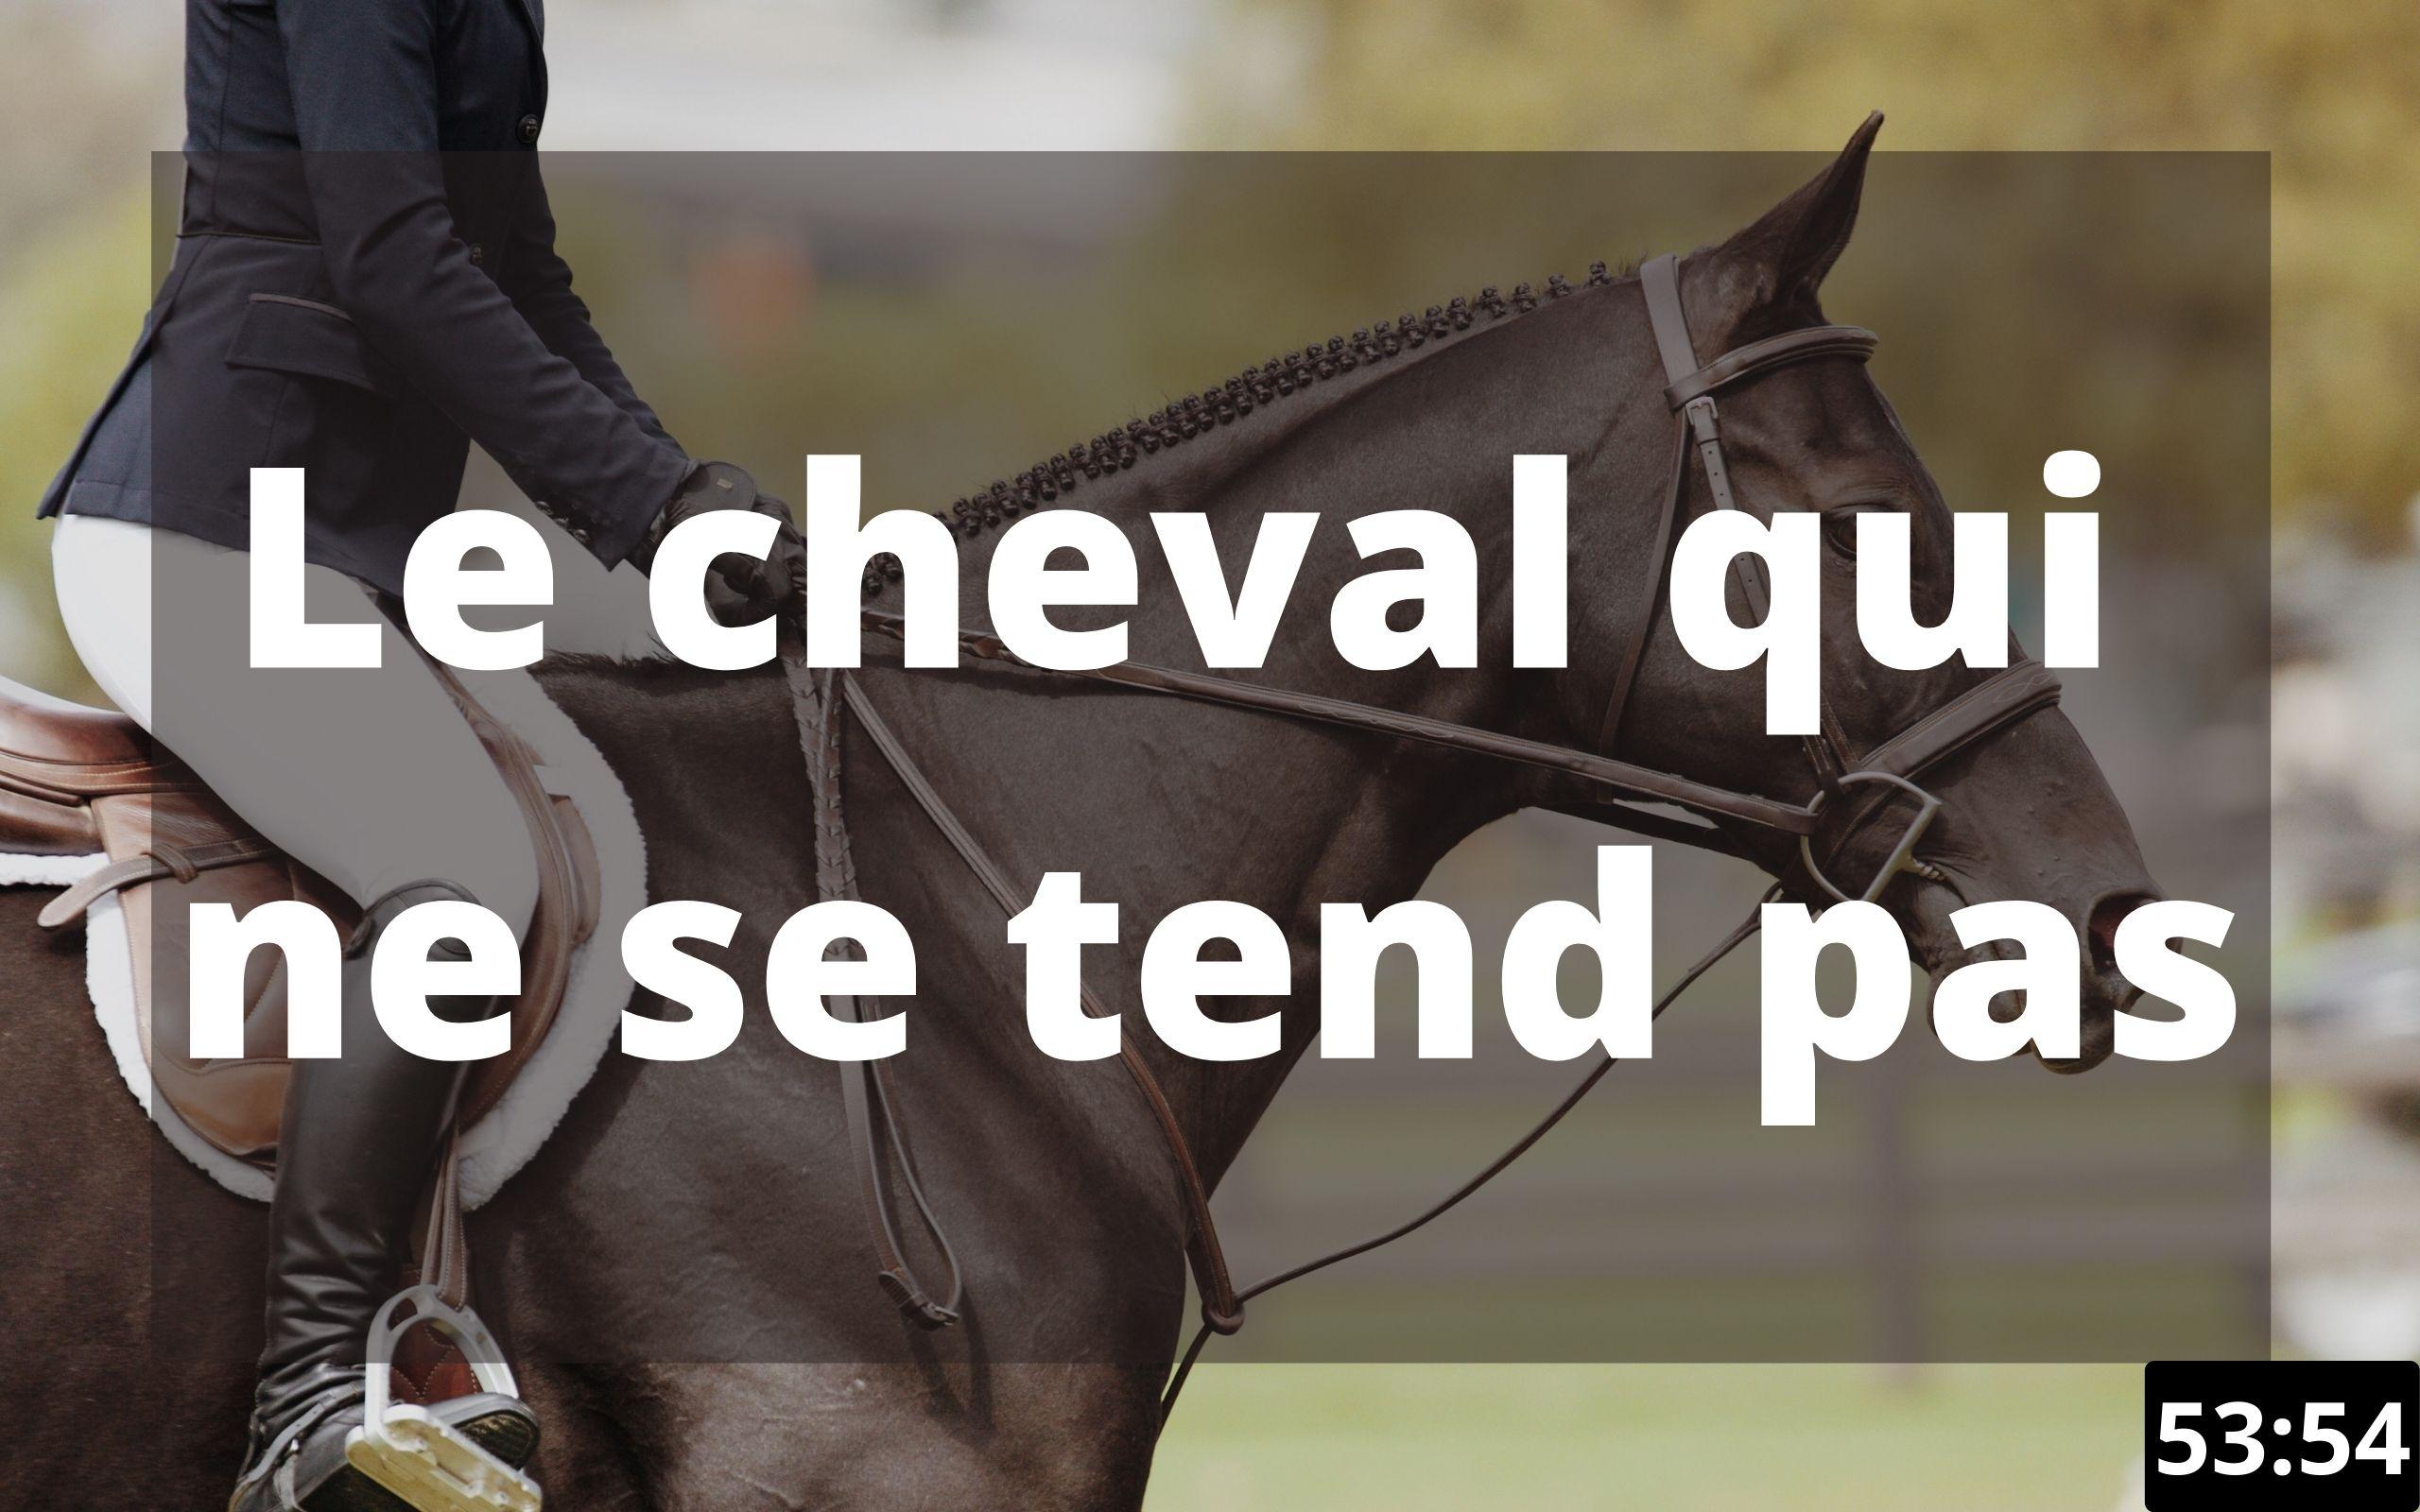 Le cheval qui ne se tend pas